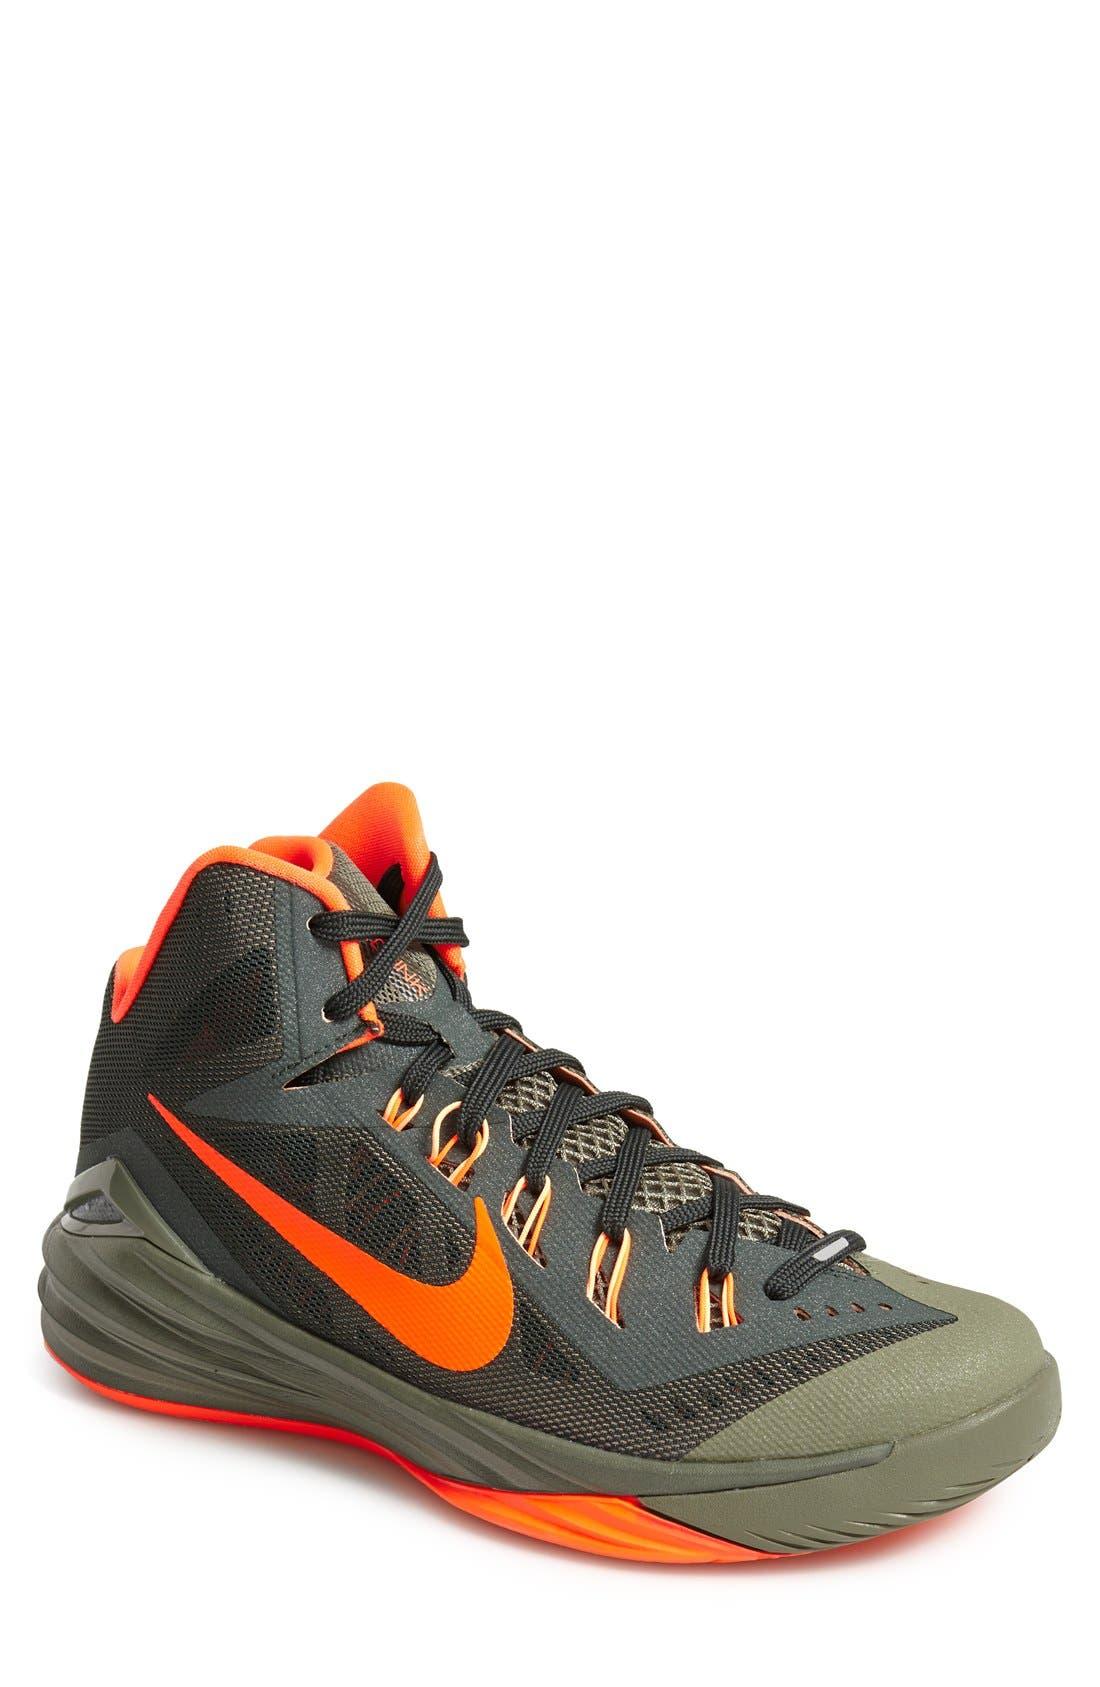 Alternate Image 1 Selected - Nike 'Hyperdunk 2014' Basketball Shoe (Men)